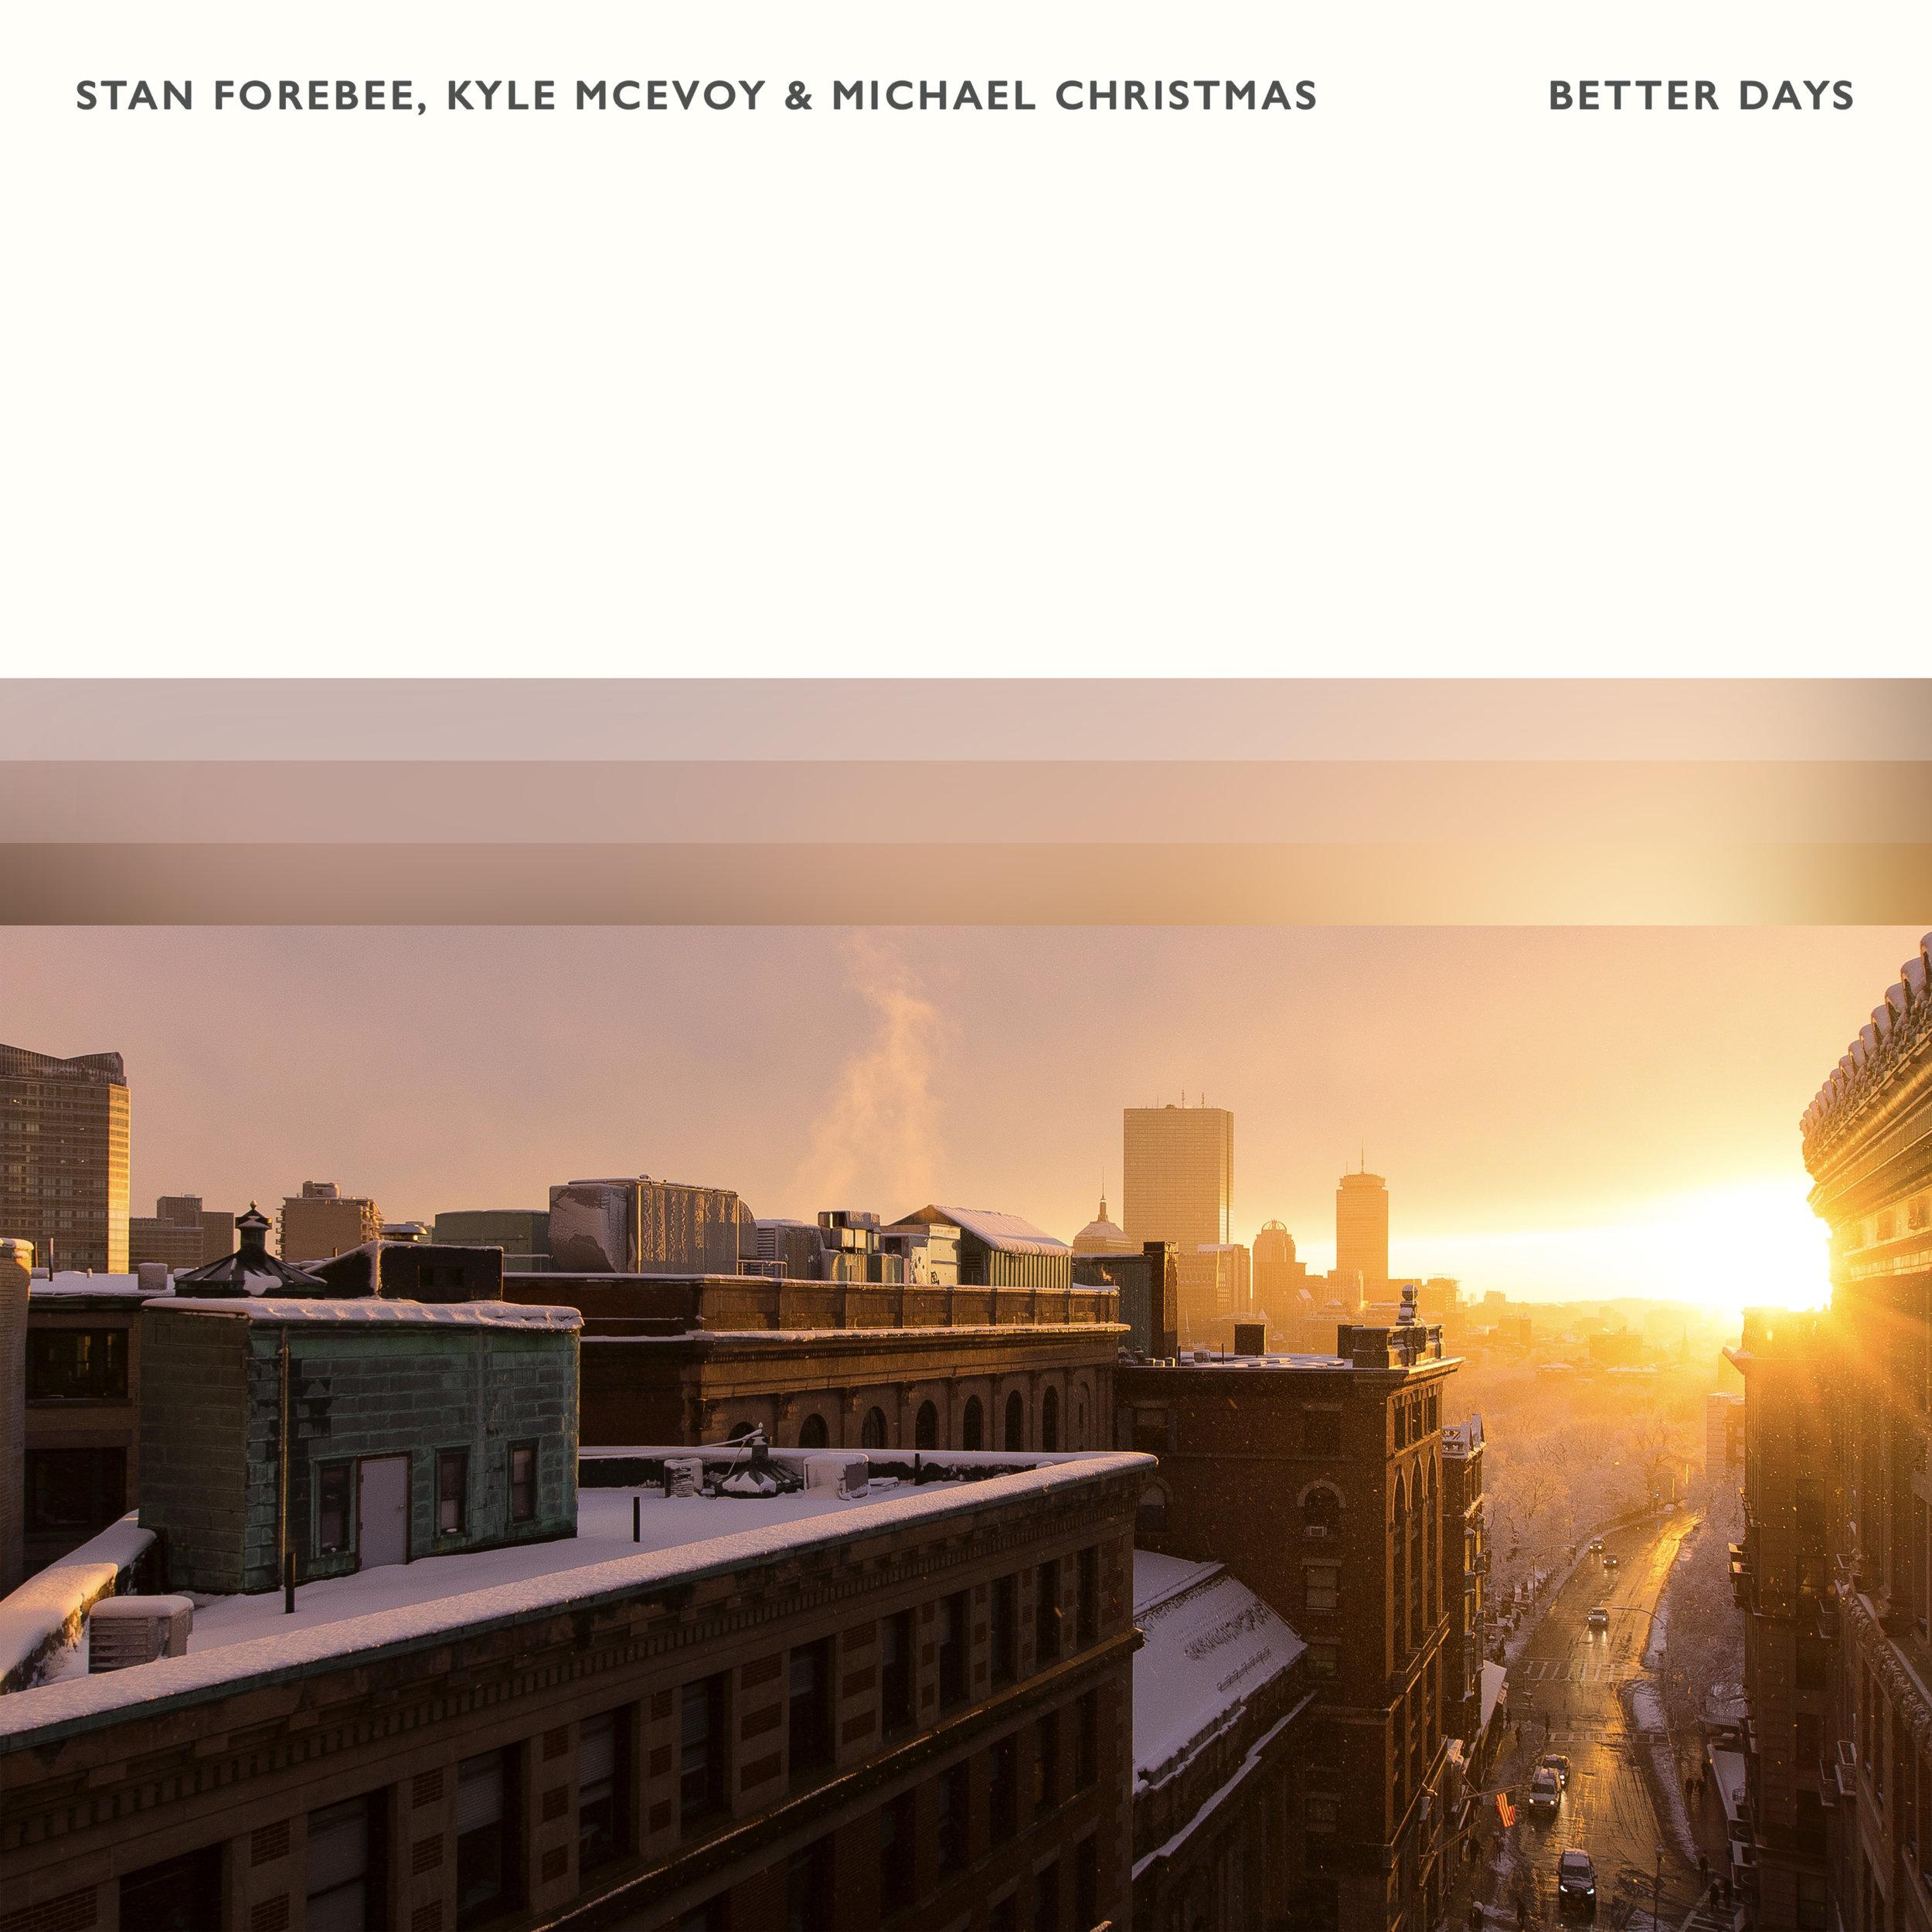 Stan Forebee, Kyle McEvoy & Michael Christmas - Better Days